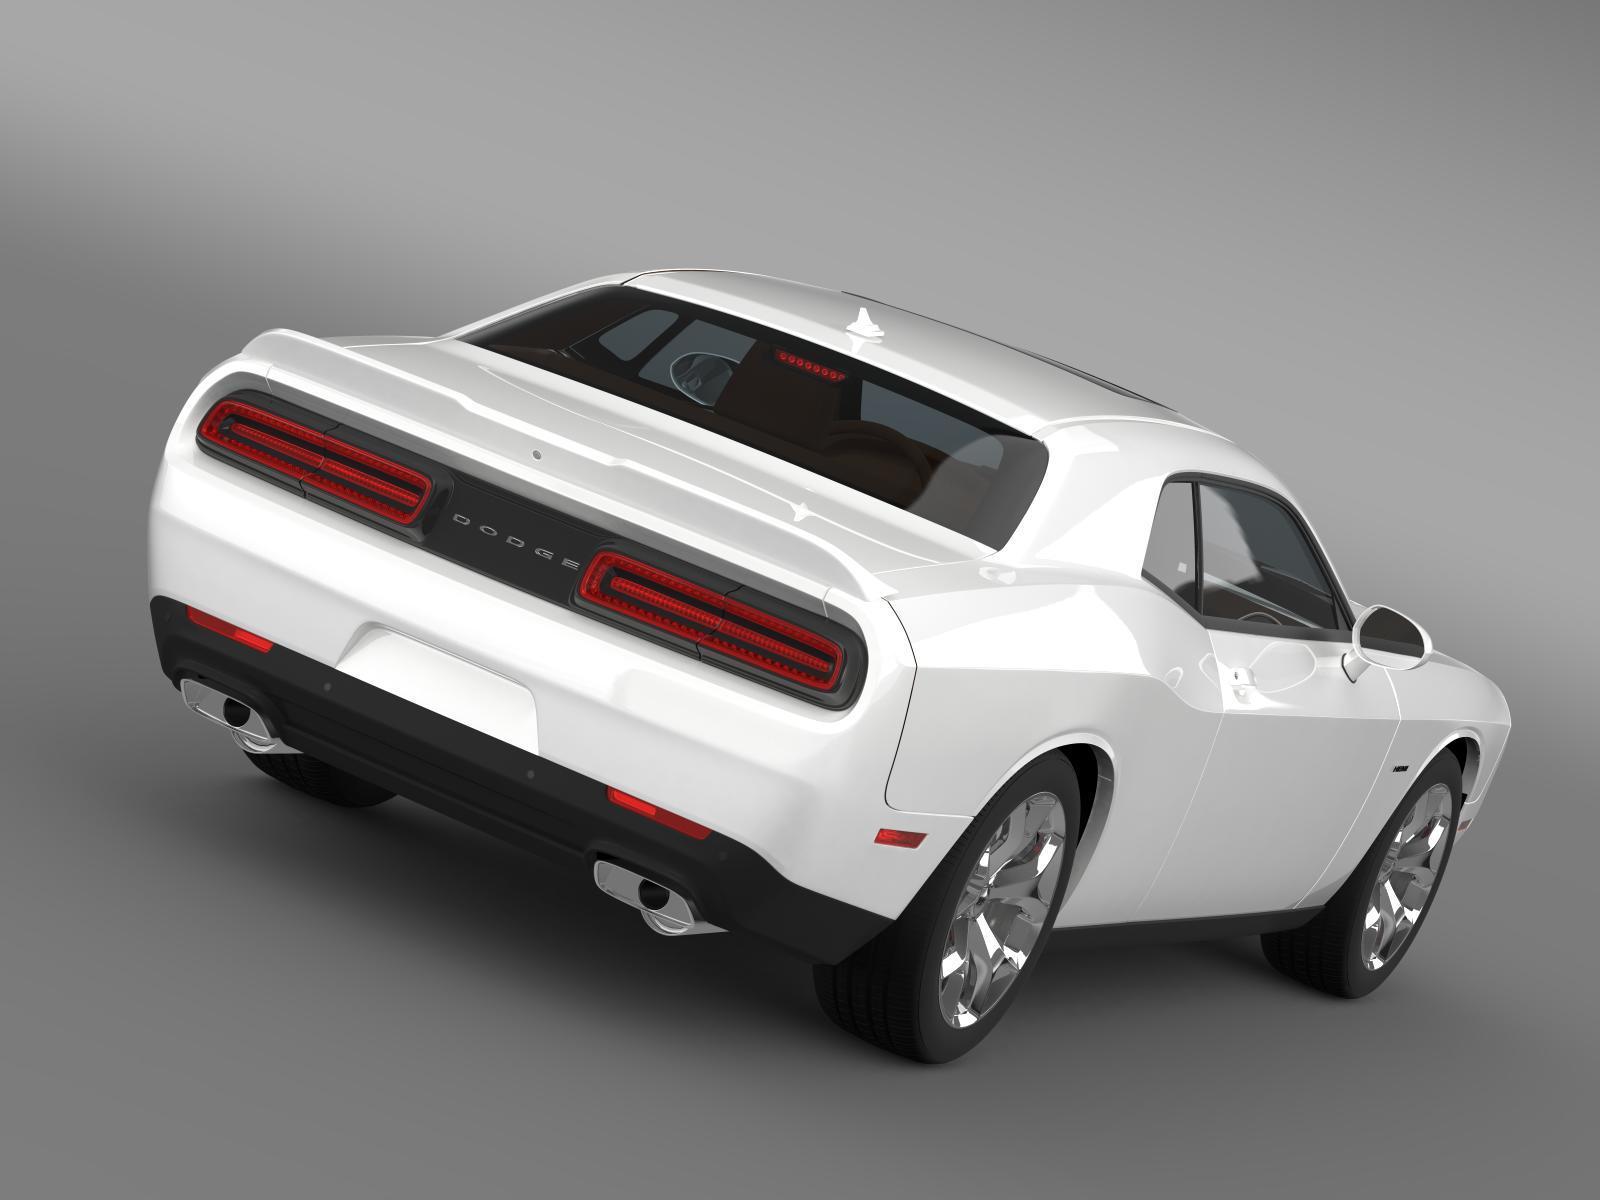 models max lw lws challenger model ma lwo widebody dodge shaker vehicles rt fbx buy